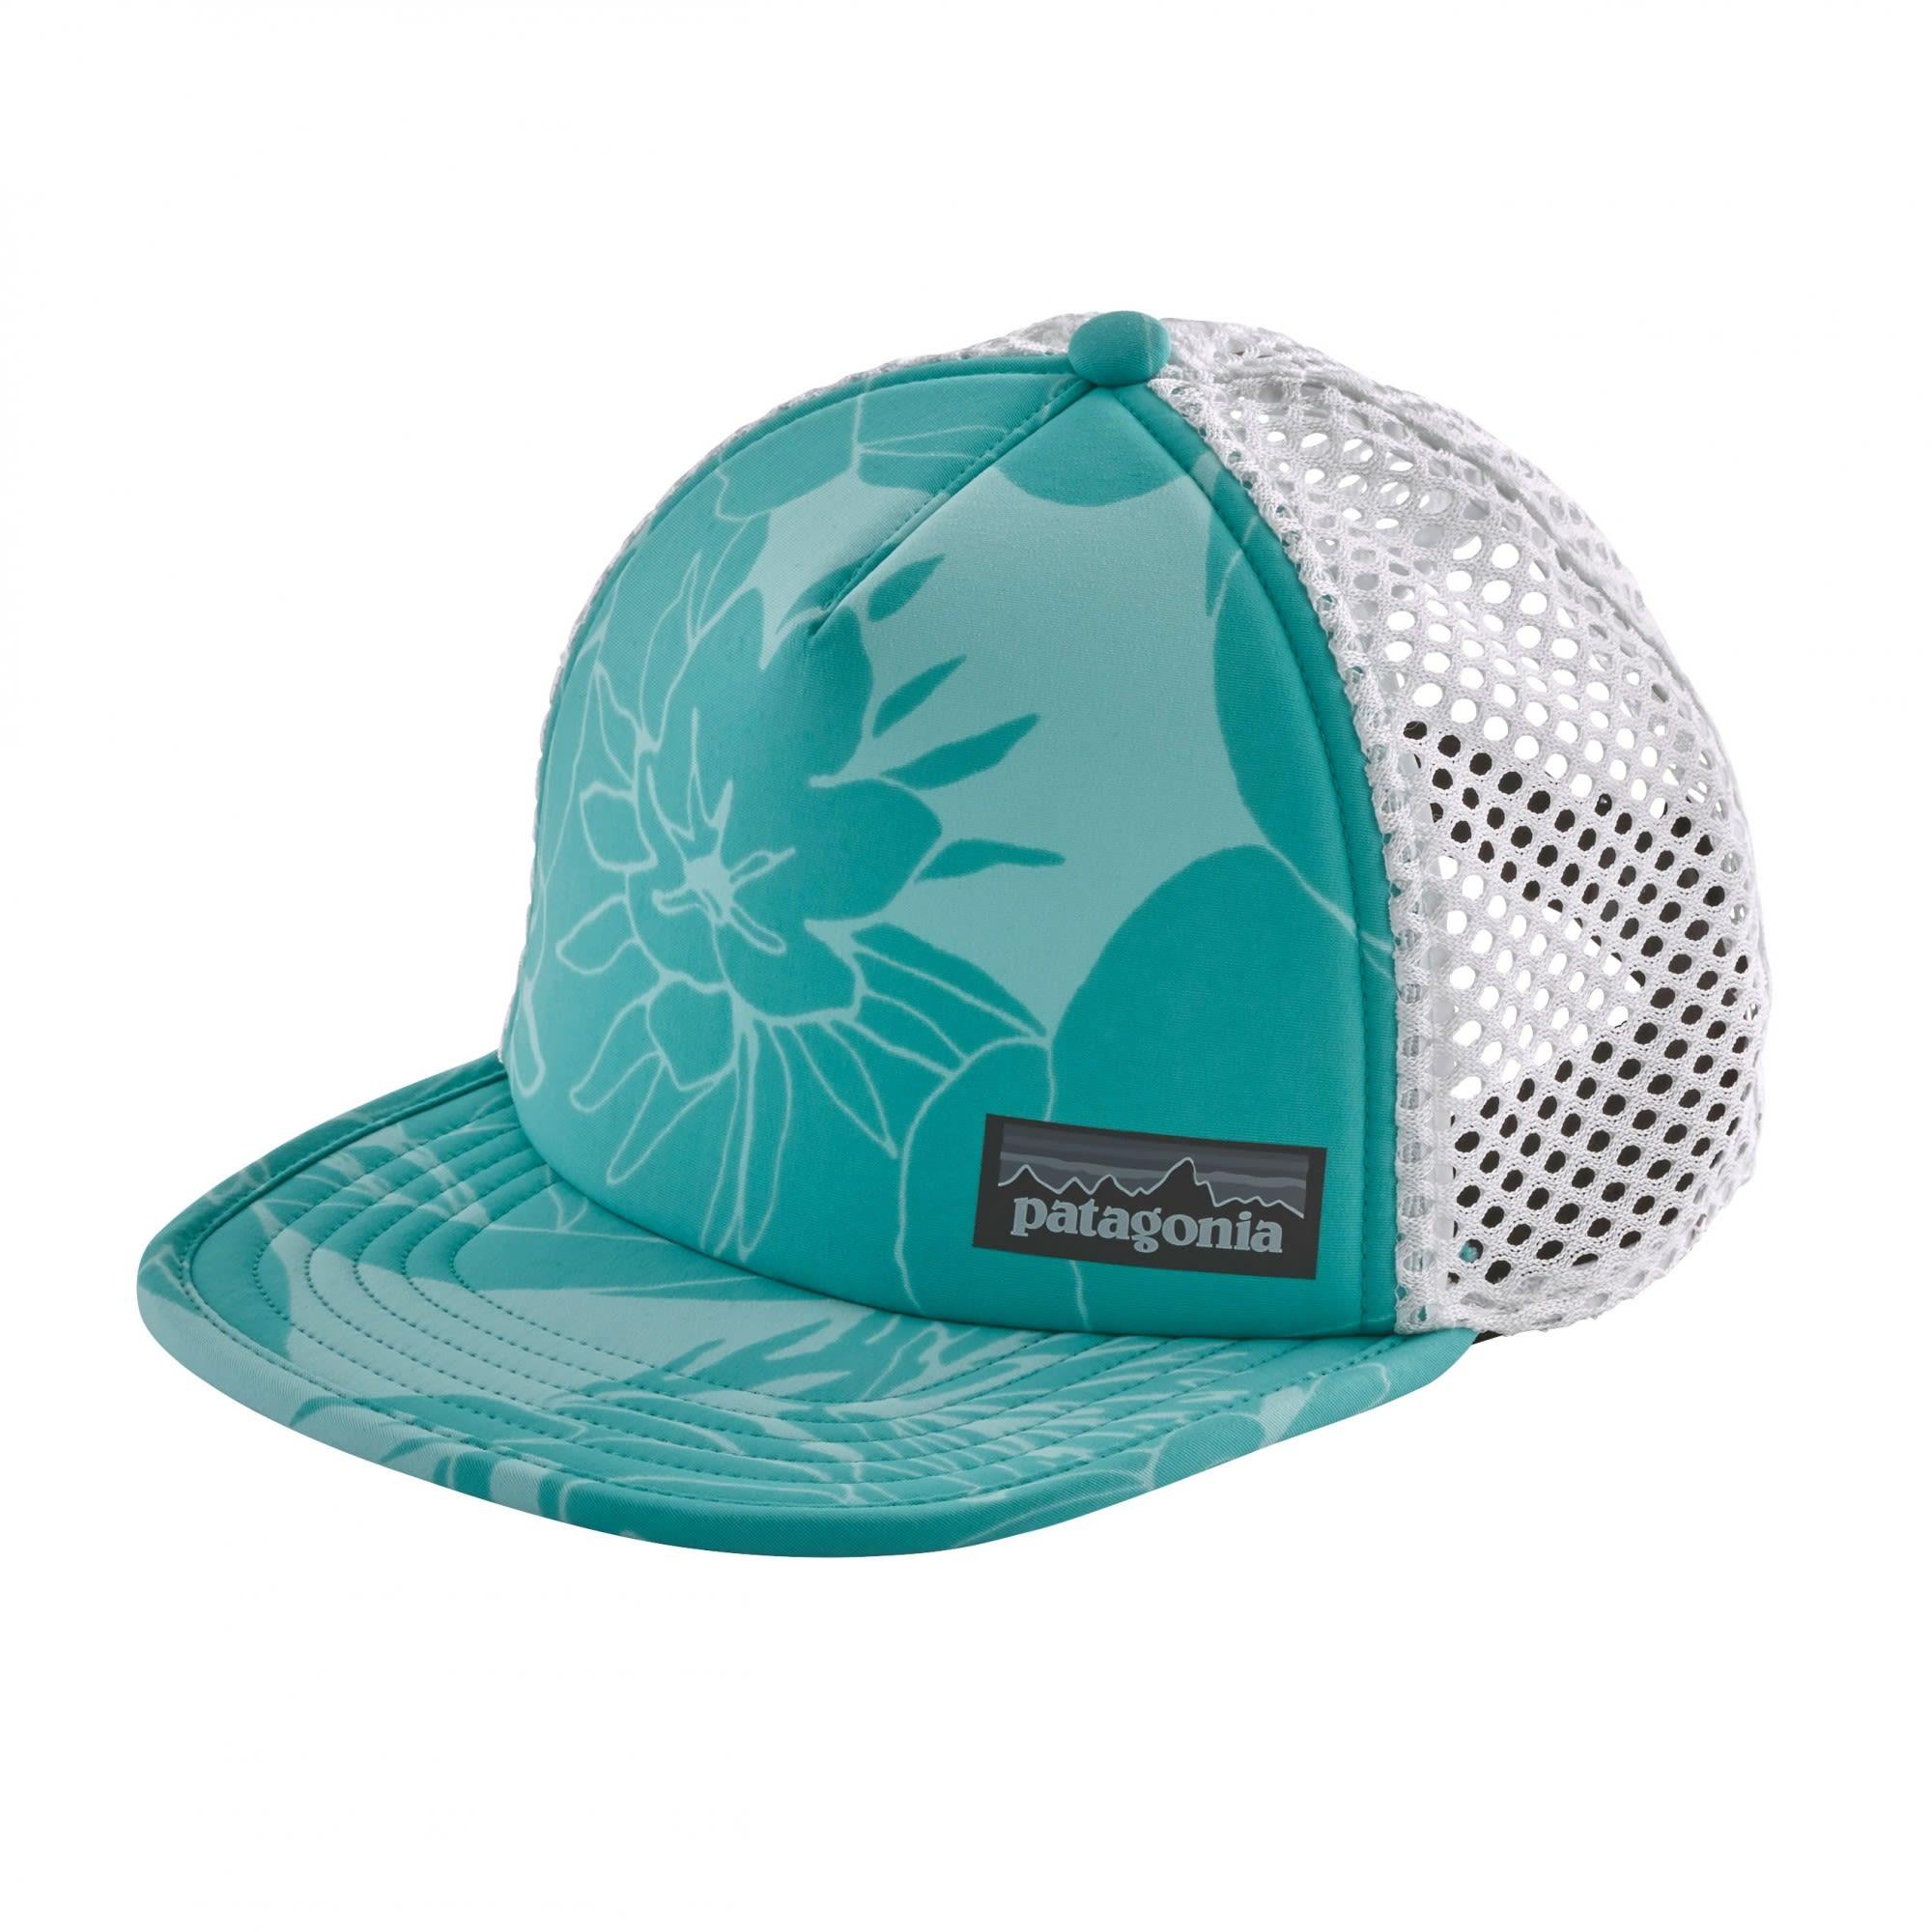 Patagonia Duckbill Trucker Hat    Accessoires